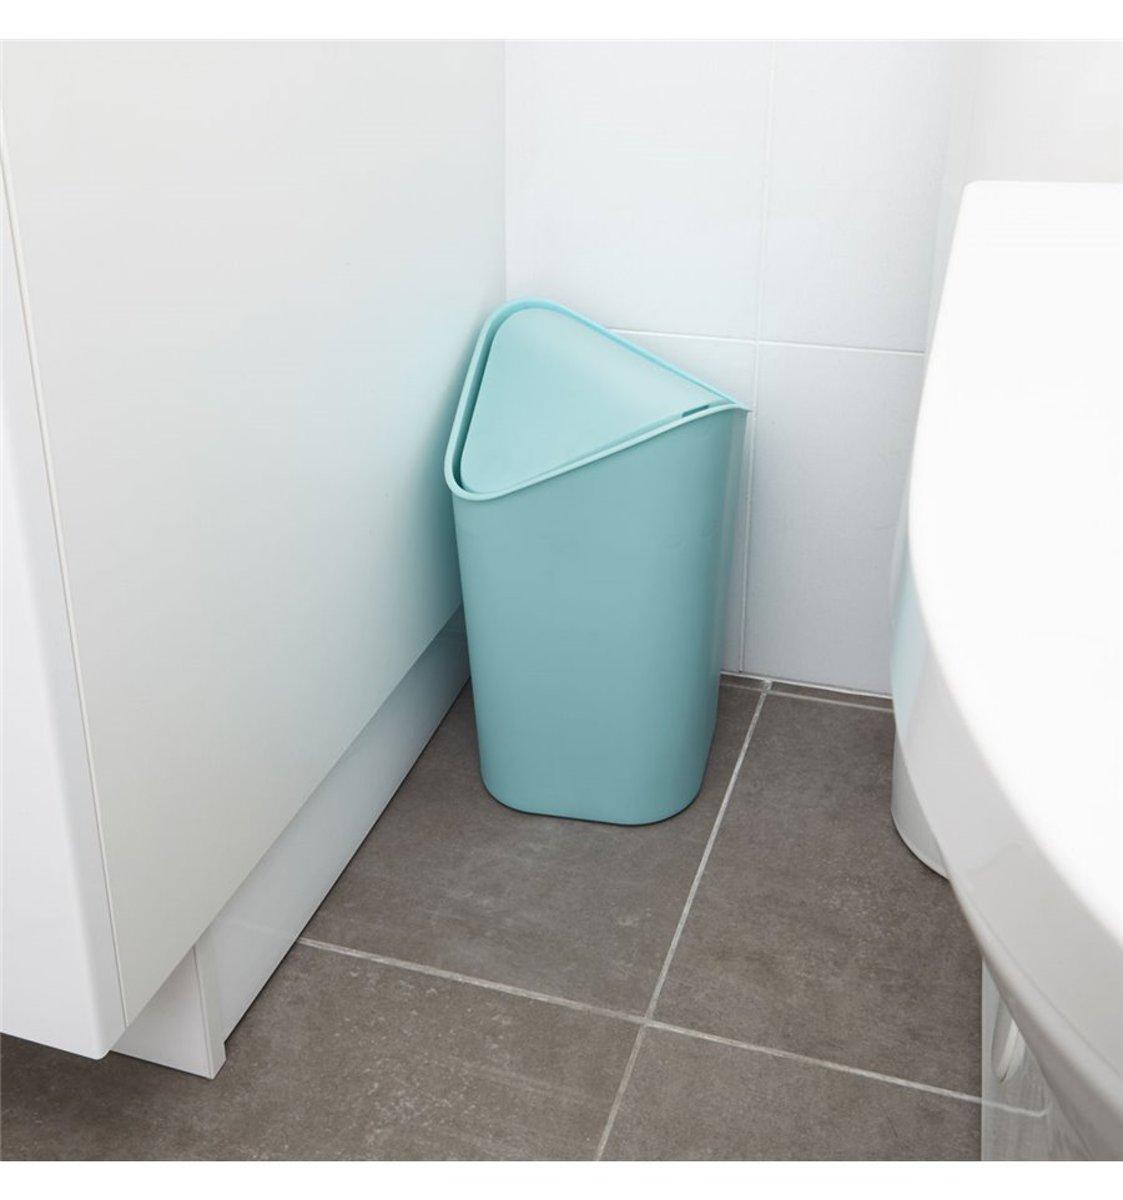 bol.com | Umbra prullenbak 5 liter mini corner - Kleur - Surf Blauw